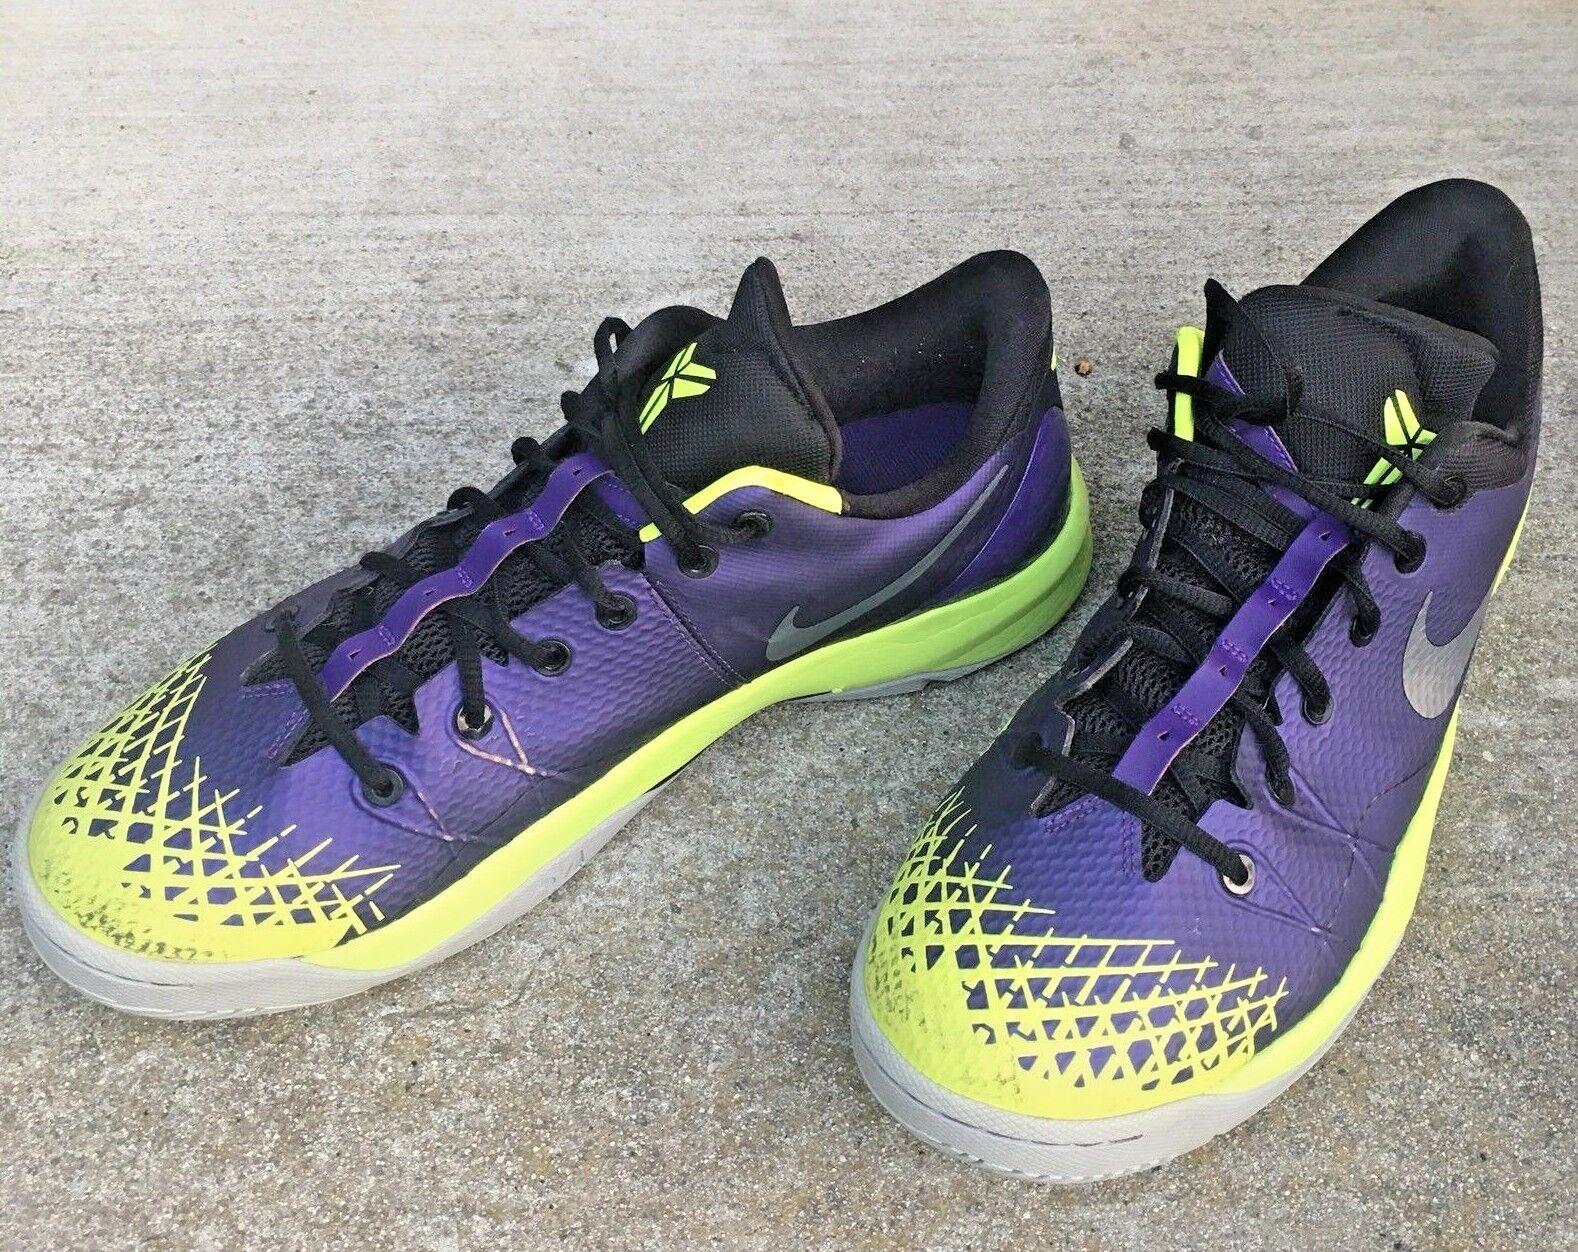 32070d8d591b Nike Zoom Kobe Venomenon 4 Mens Basketball Shoes 635578-500 Sz 13 Ct ...